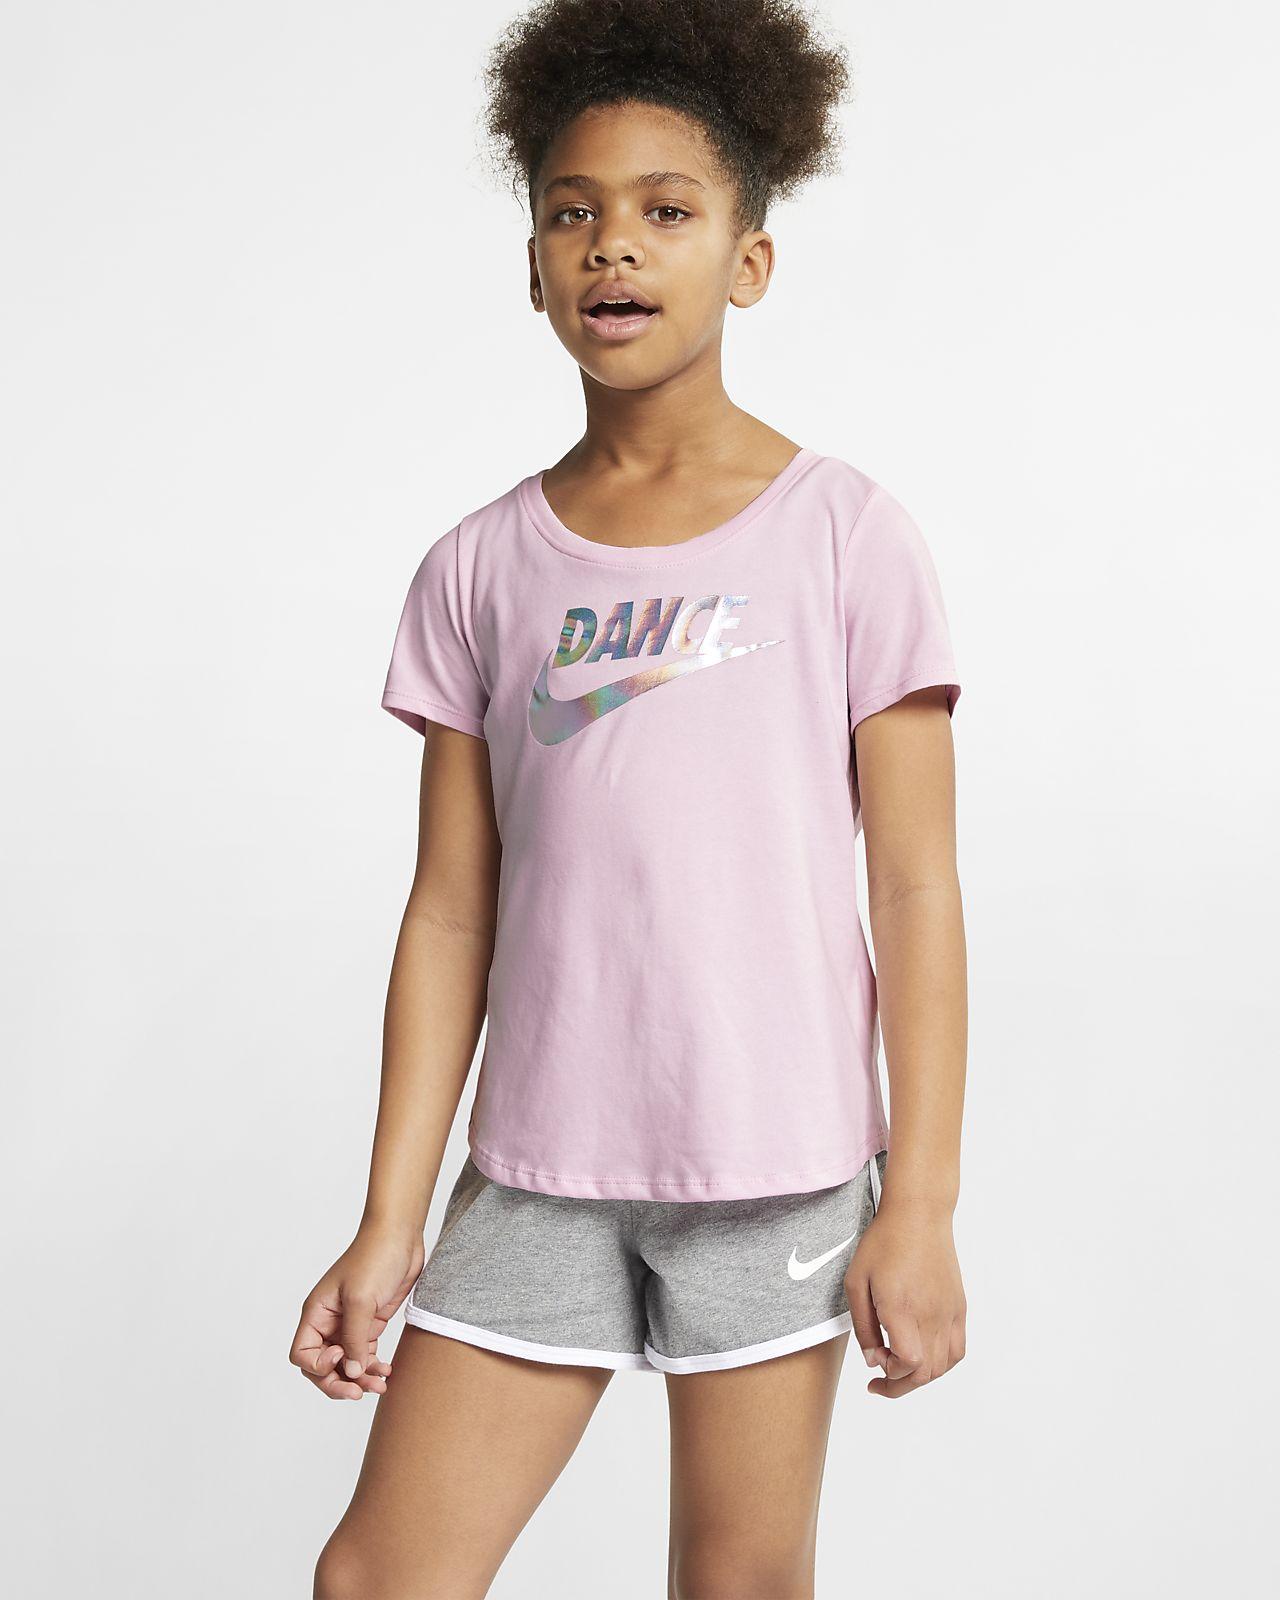 Nike Dri-FIT T-Shirt für ältere Kinder (Mädchen)